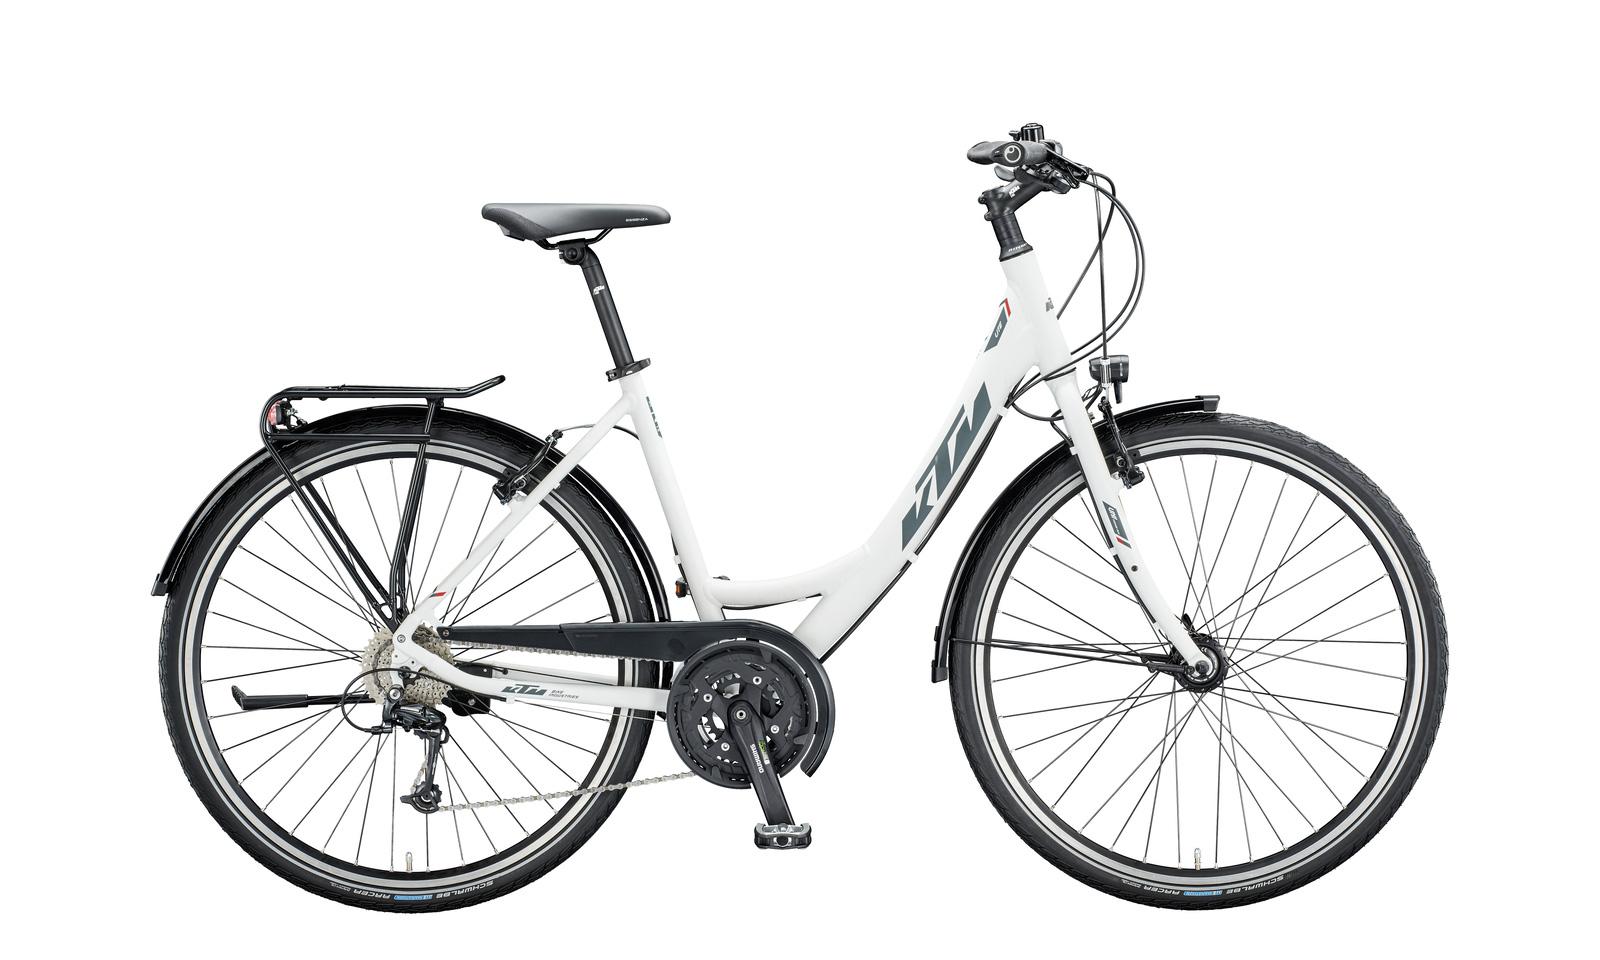 Biciclete KTM Trekking Onroad LIFE LITE 3x9 Shimano Deore